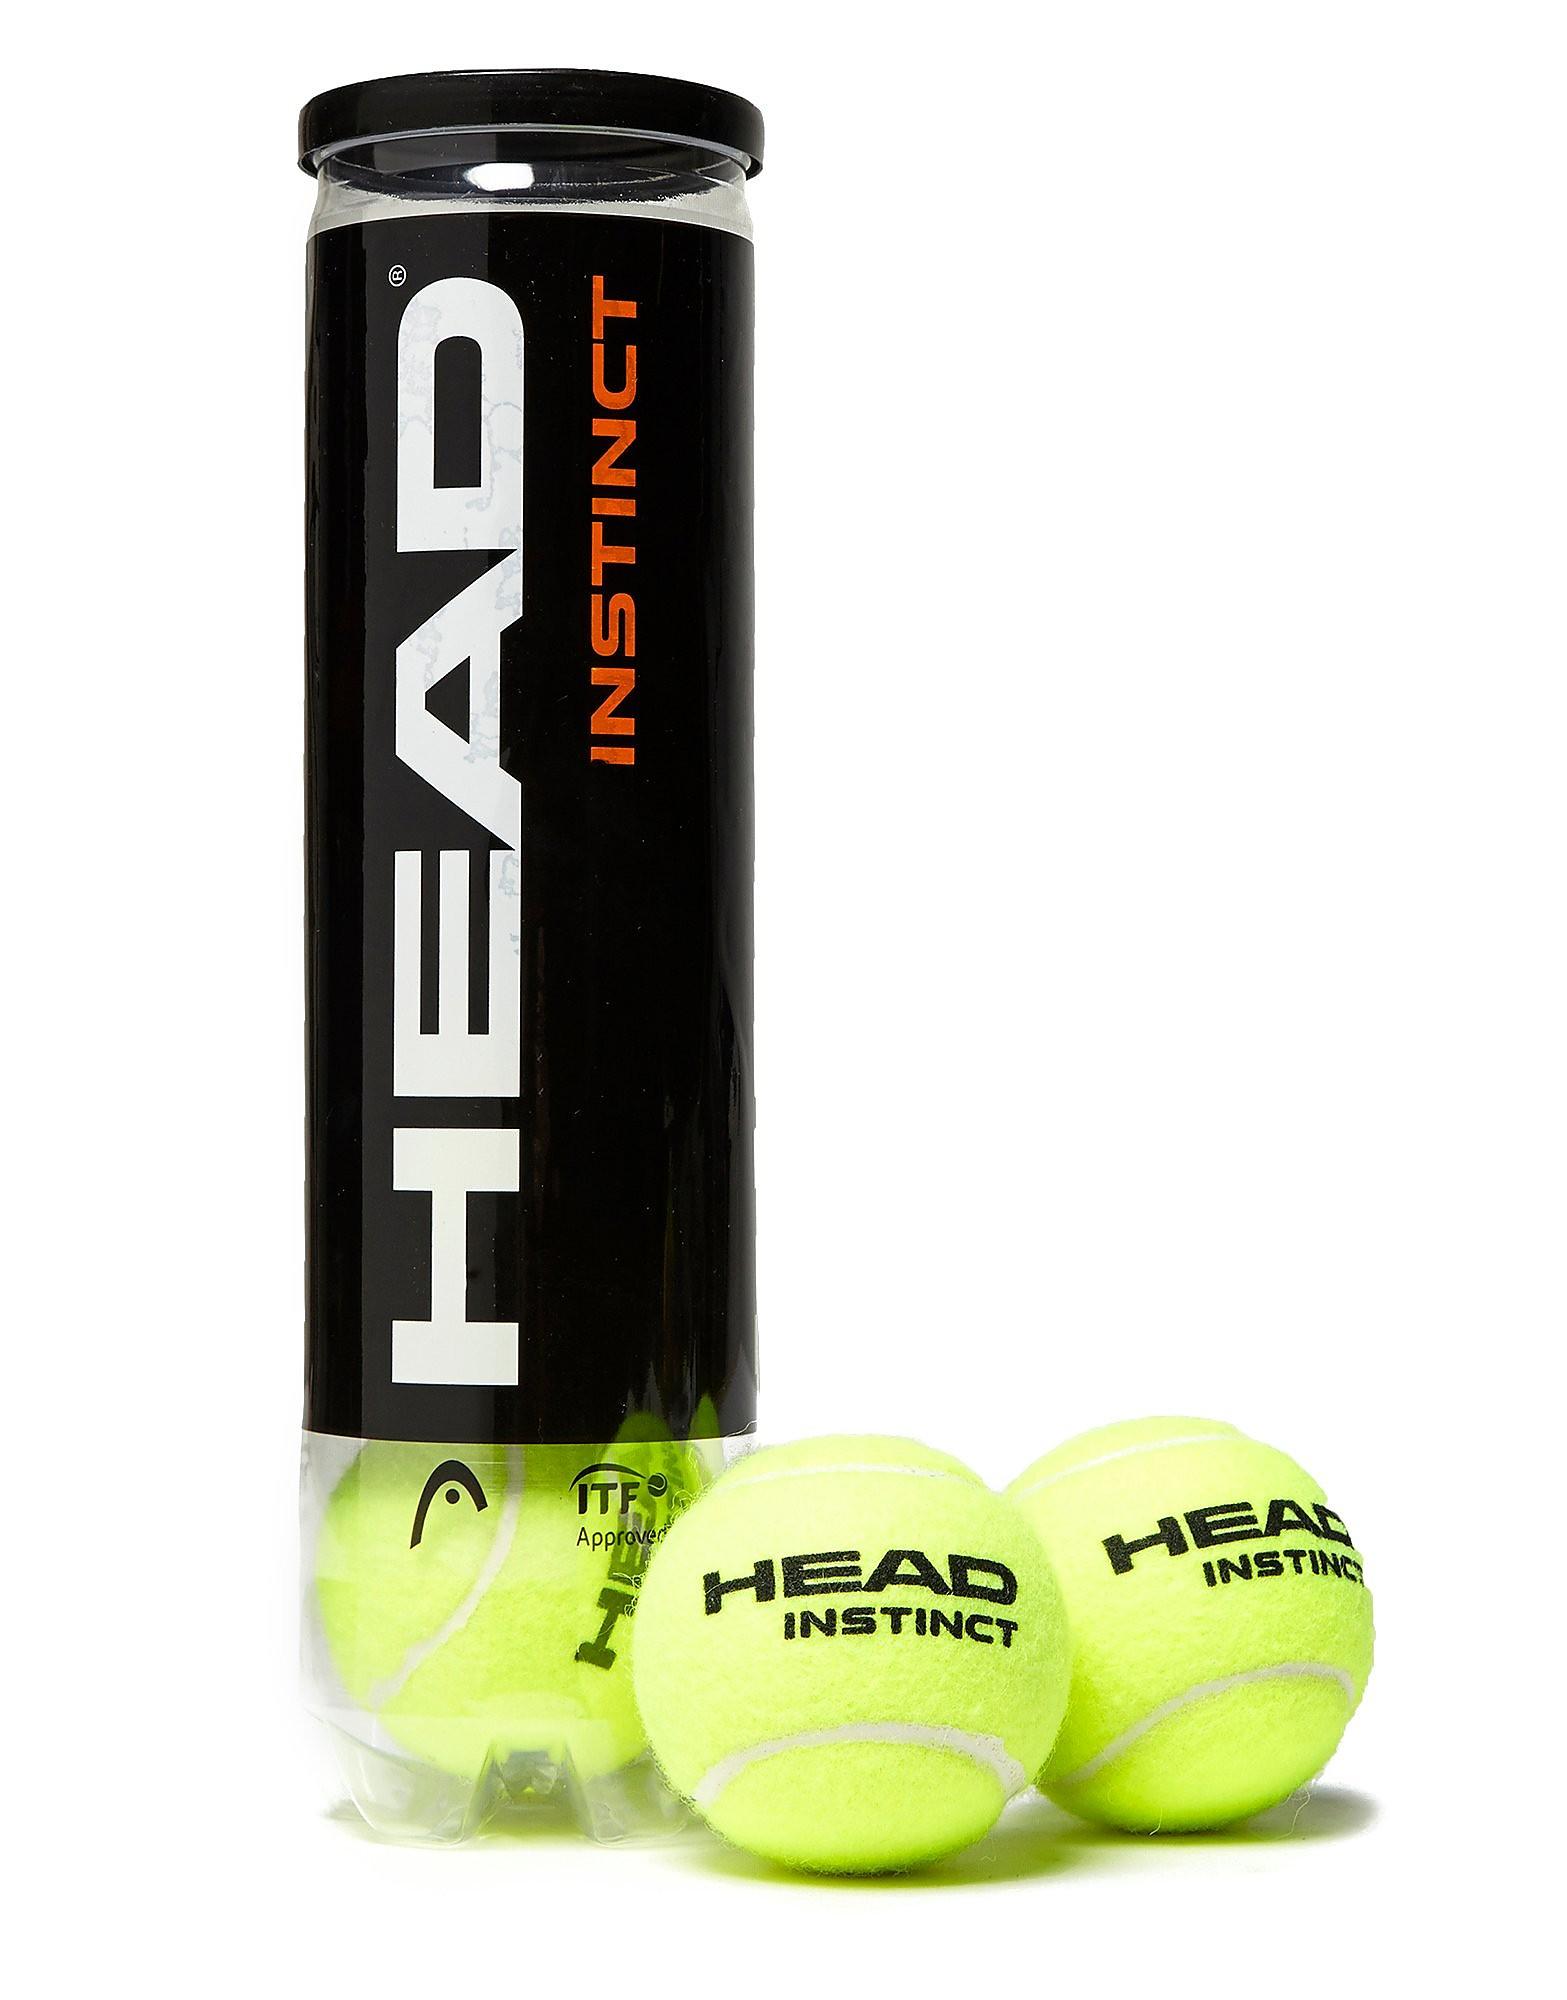 Head Instinct Tennis Balls (4 Balls)